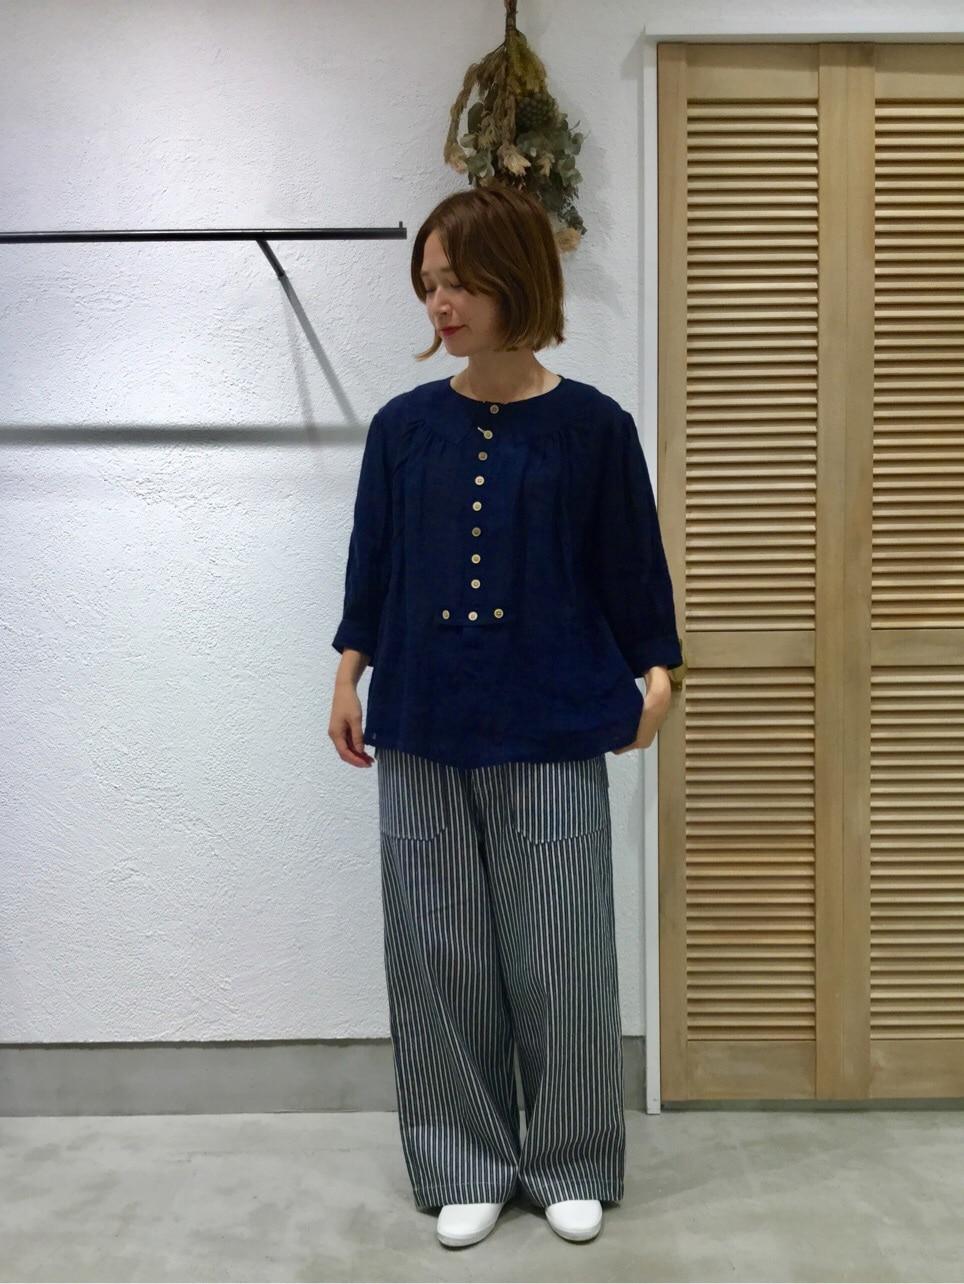 chambre de charme 横浜ジョイナス 身長:160cm 2020.07.21